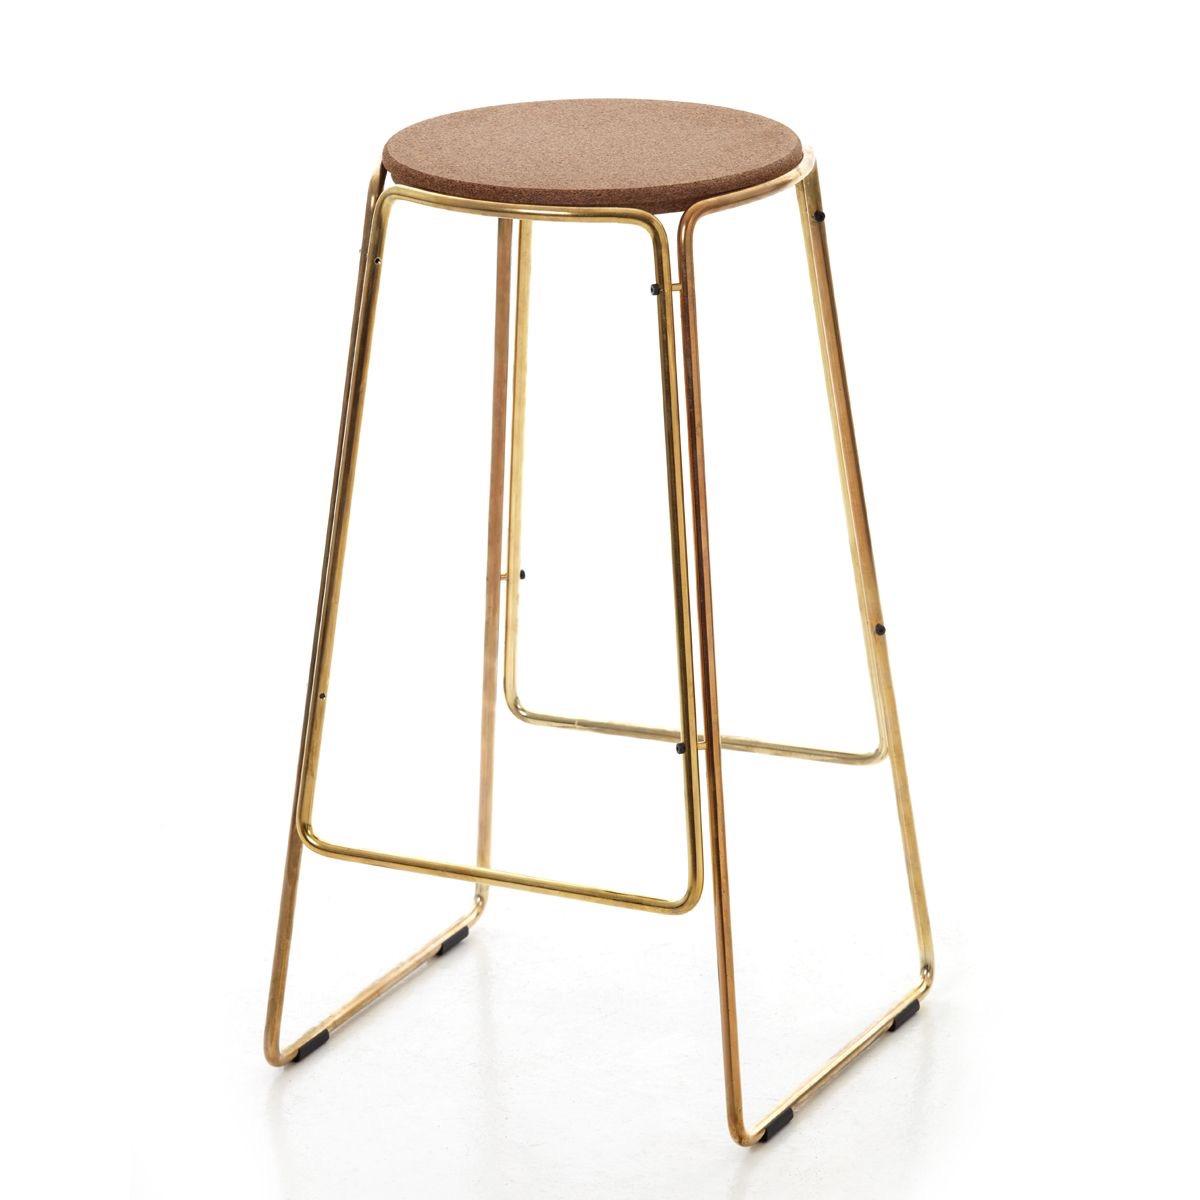 Terrific Find The Perfect Stool Machost Co Dining Chair Design Ideas Machostcouk